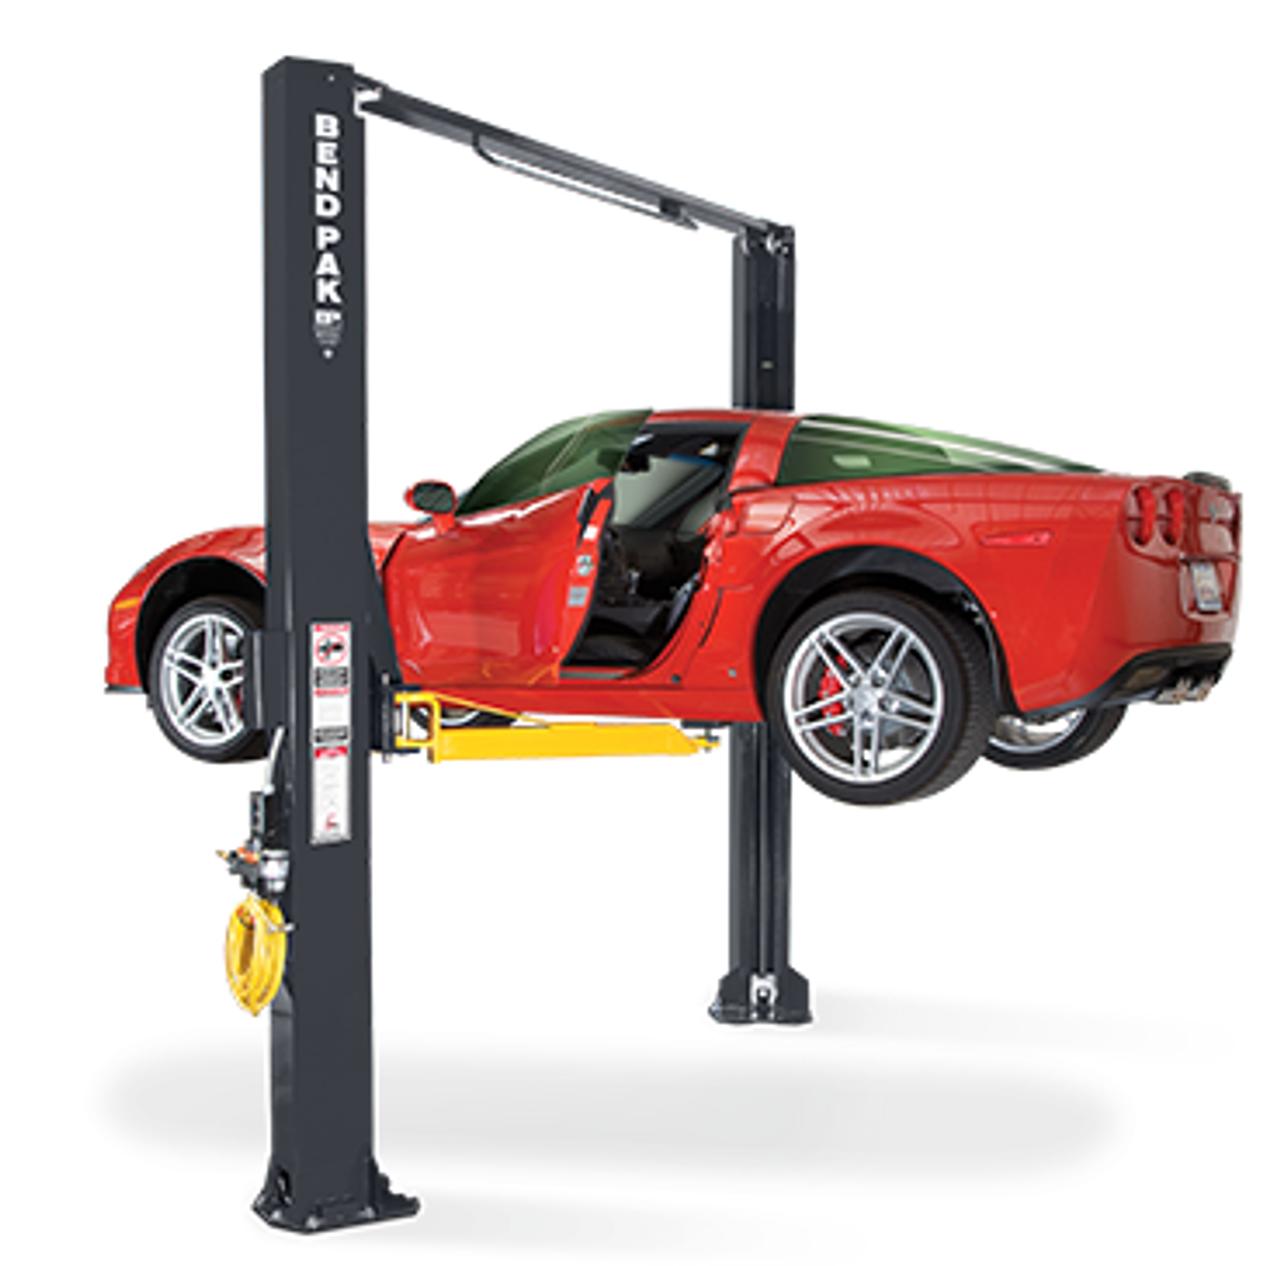 bendpak xpr 10as dual width, 10,000 lb capacity, two post lift truck wiring diagram bendpak xpr 10as dual width, 10,000 lb capacity, two post lift